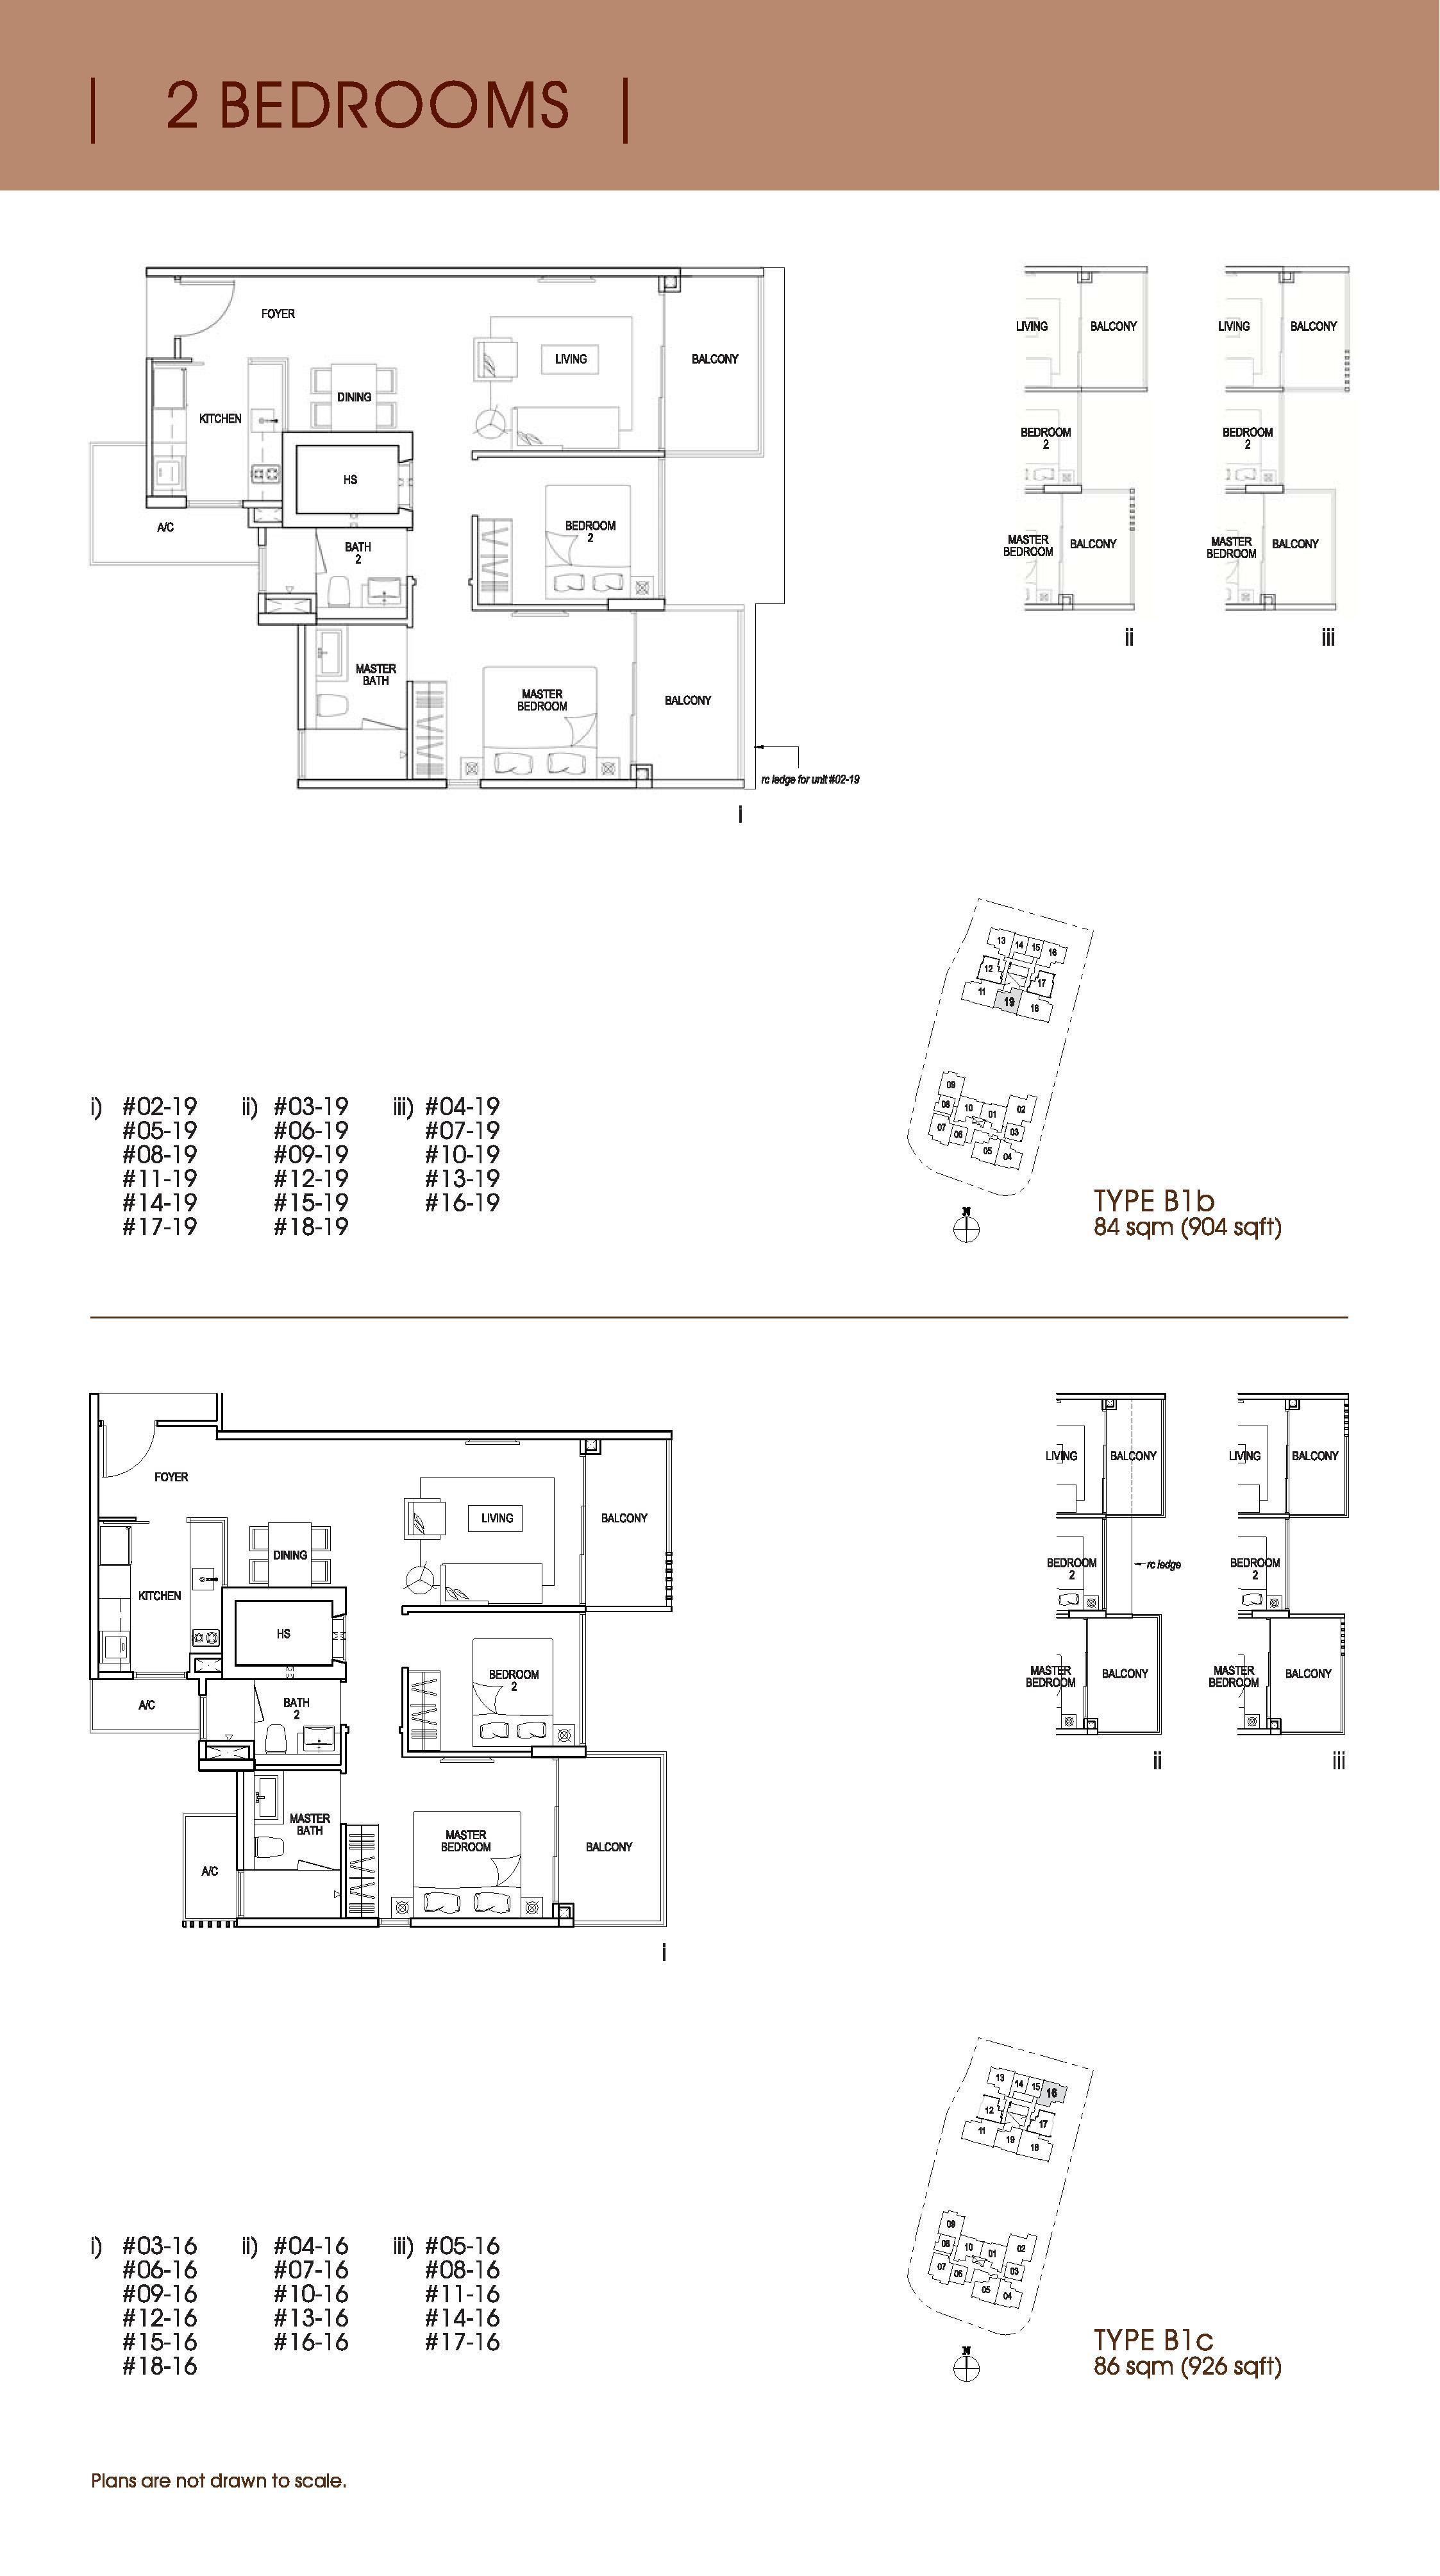 Nin Residence 2 Bedroom Floor Plans Type B1b, B1c